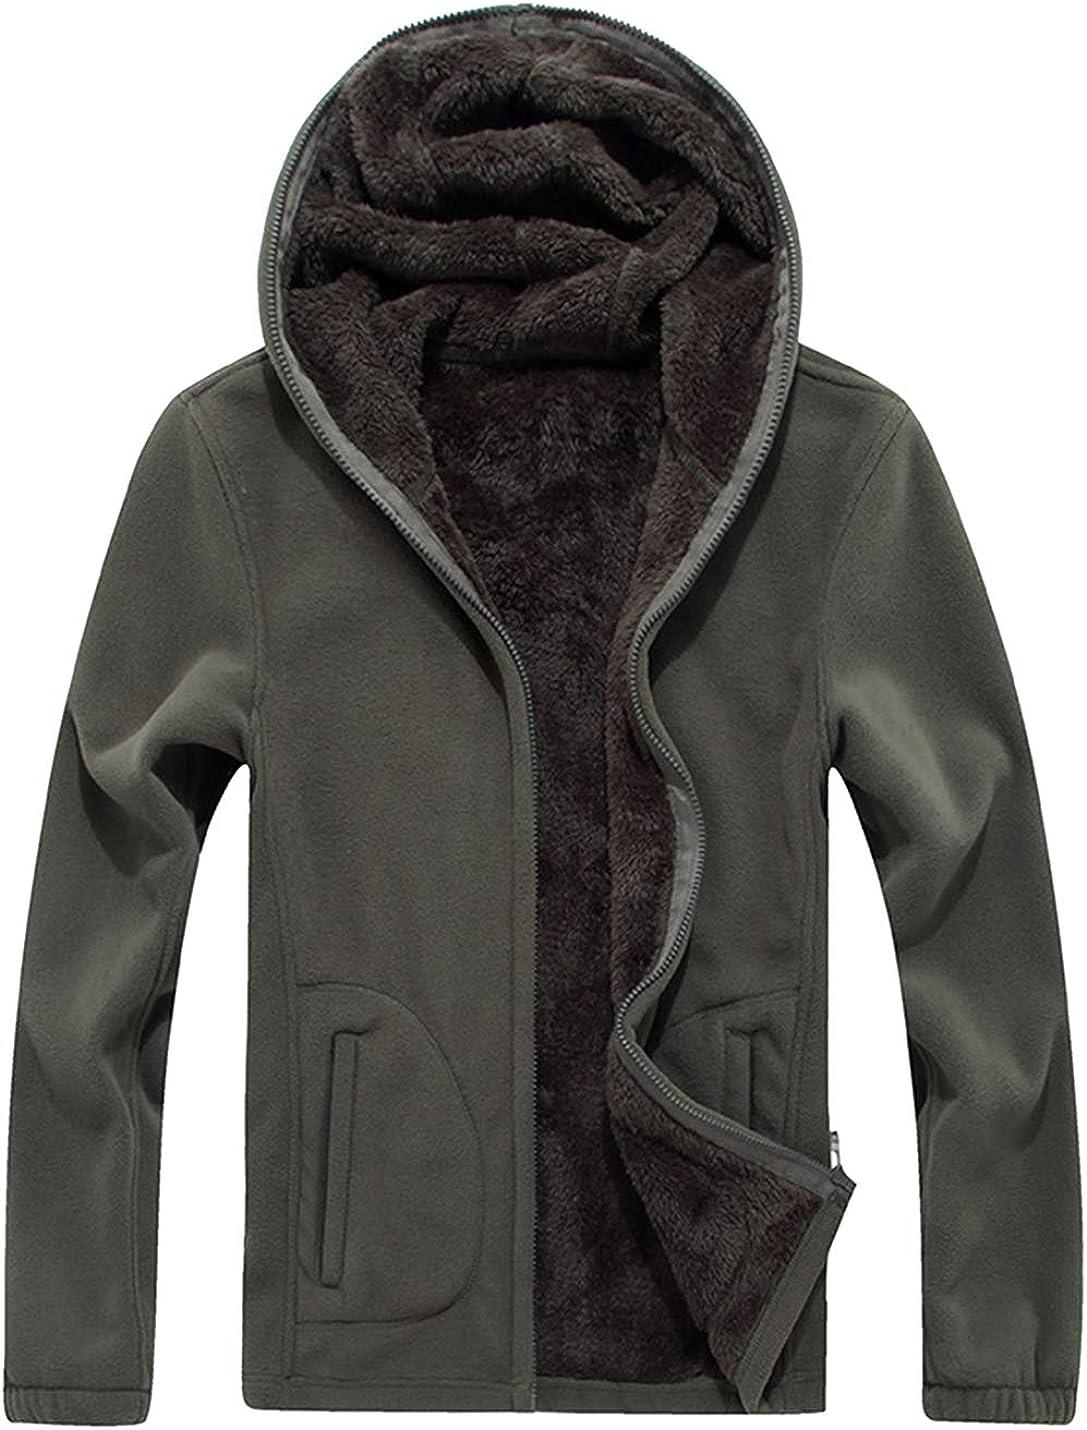 Gihuo Womens Sherpa Fleece Lined Hoodie Zip Up Hooded Sweatshirt Jacket